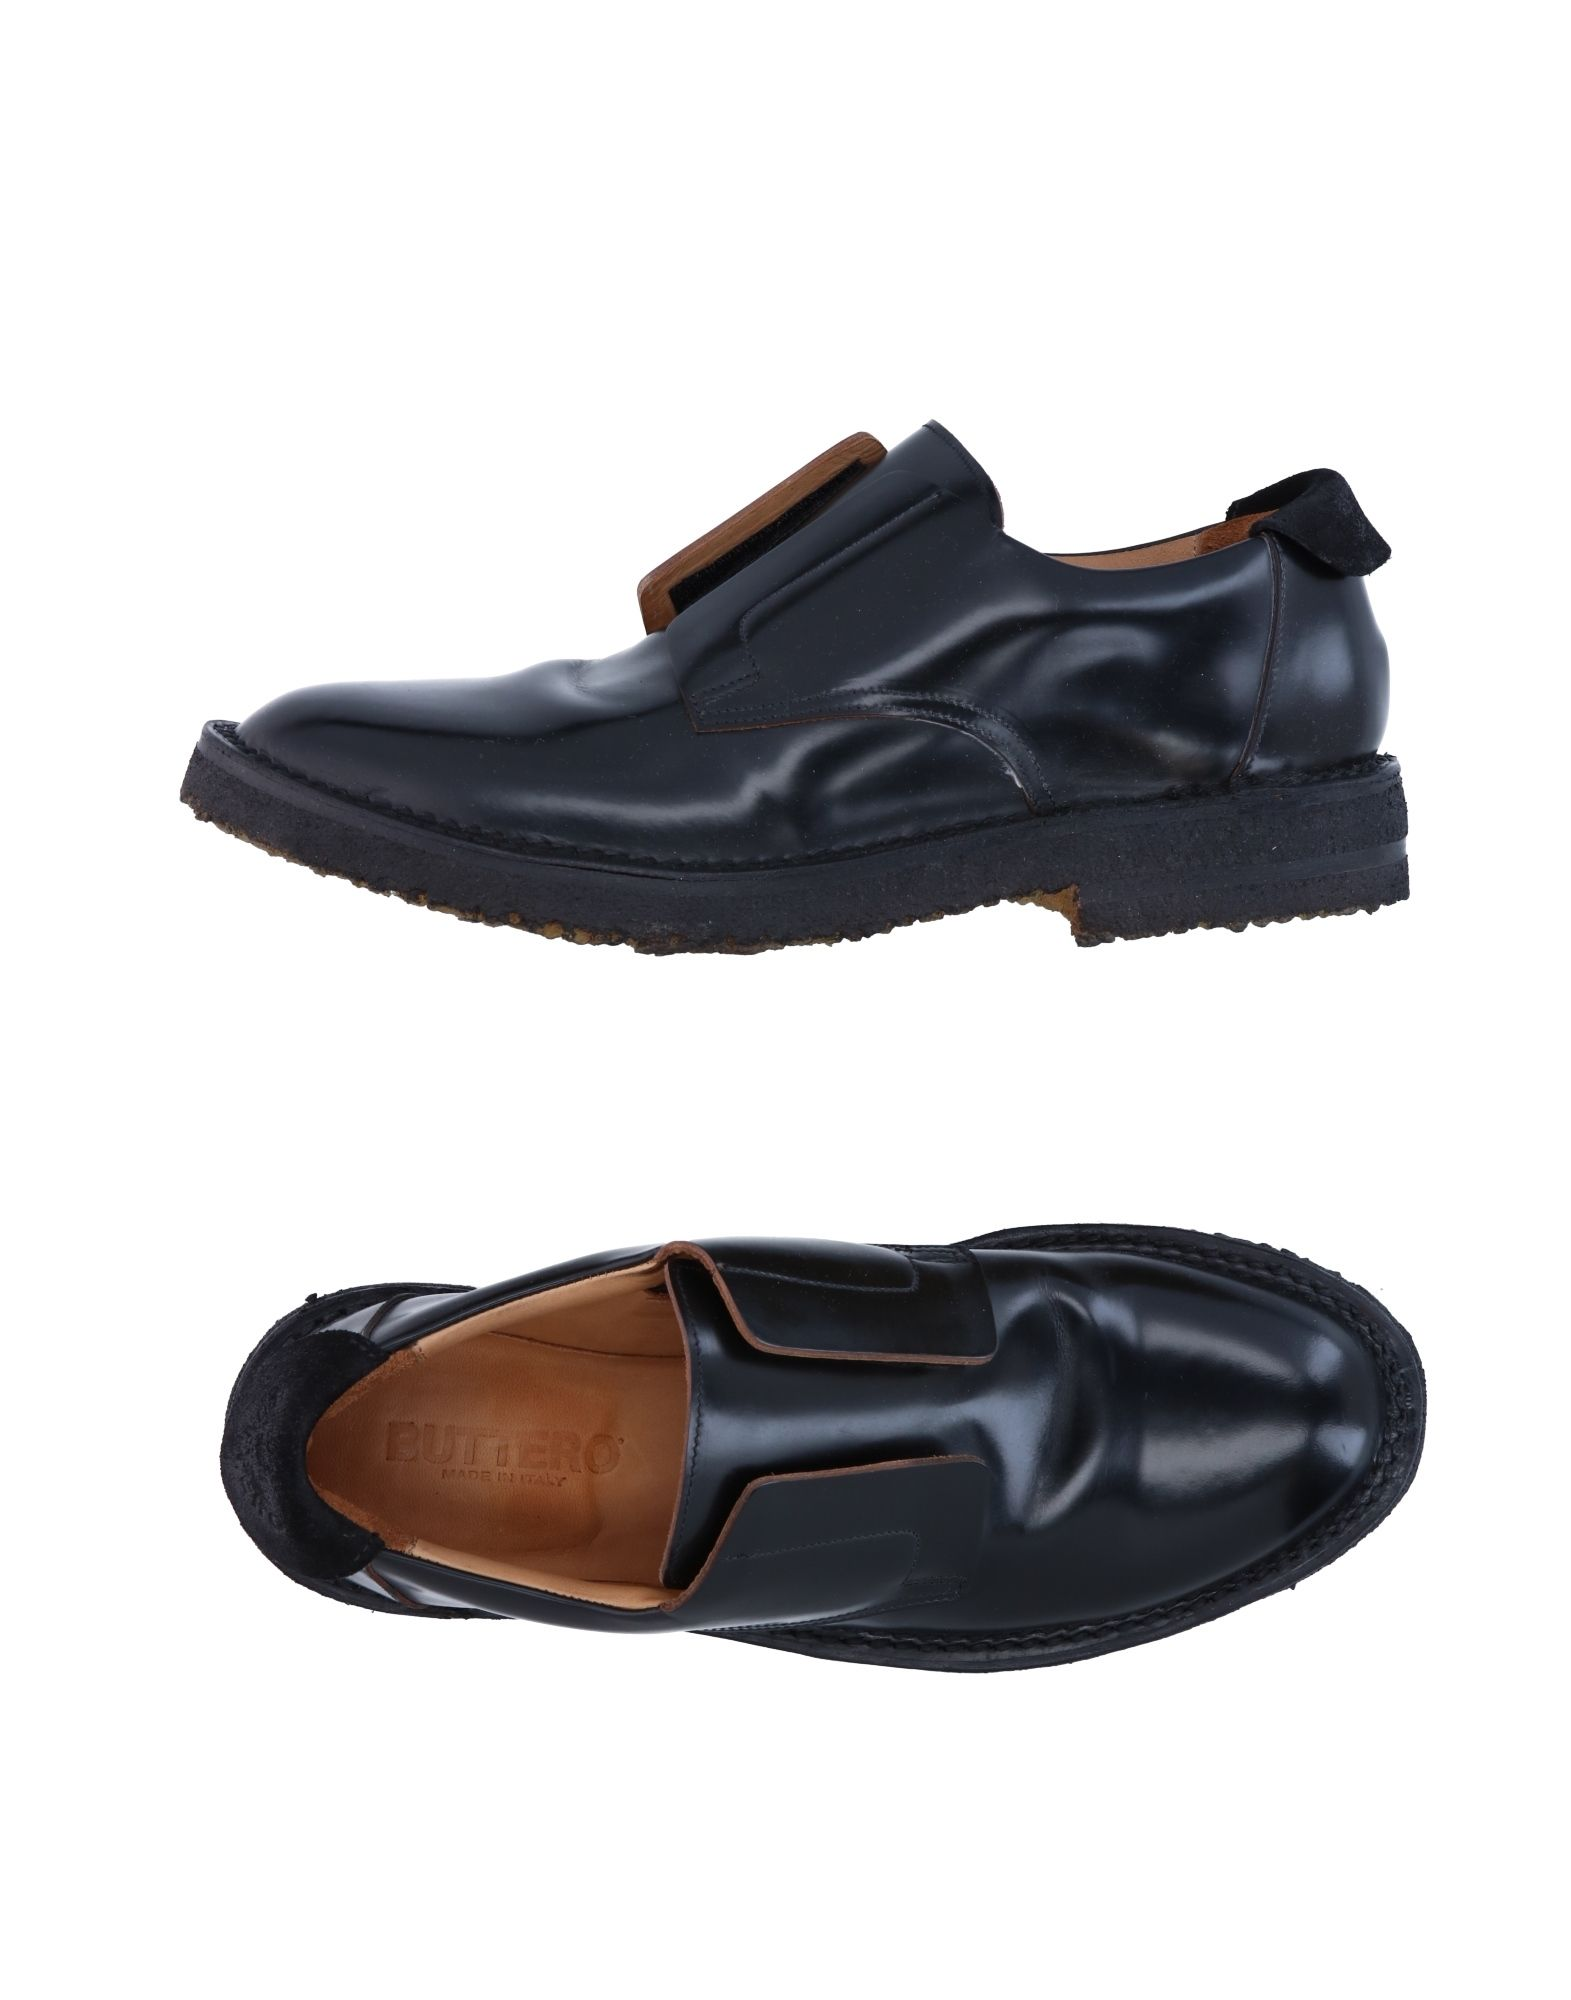 Buttero® Mokassins Herren  11263454SG Gute Qualität beliebte Schuhe